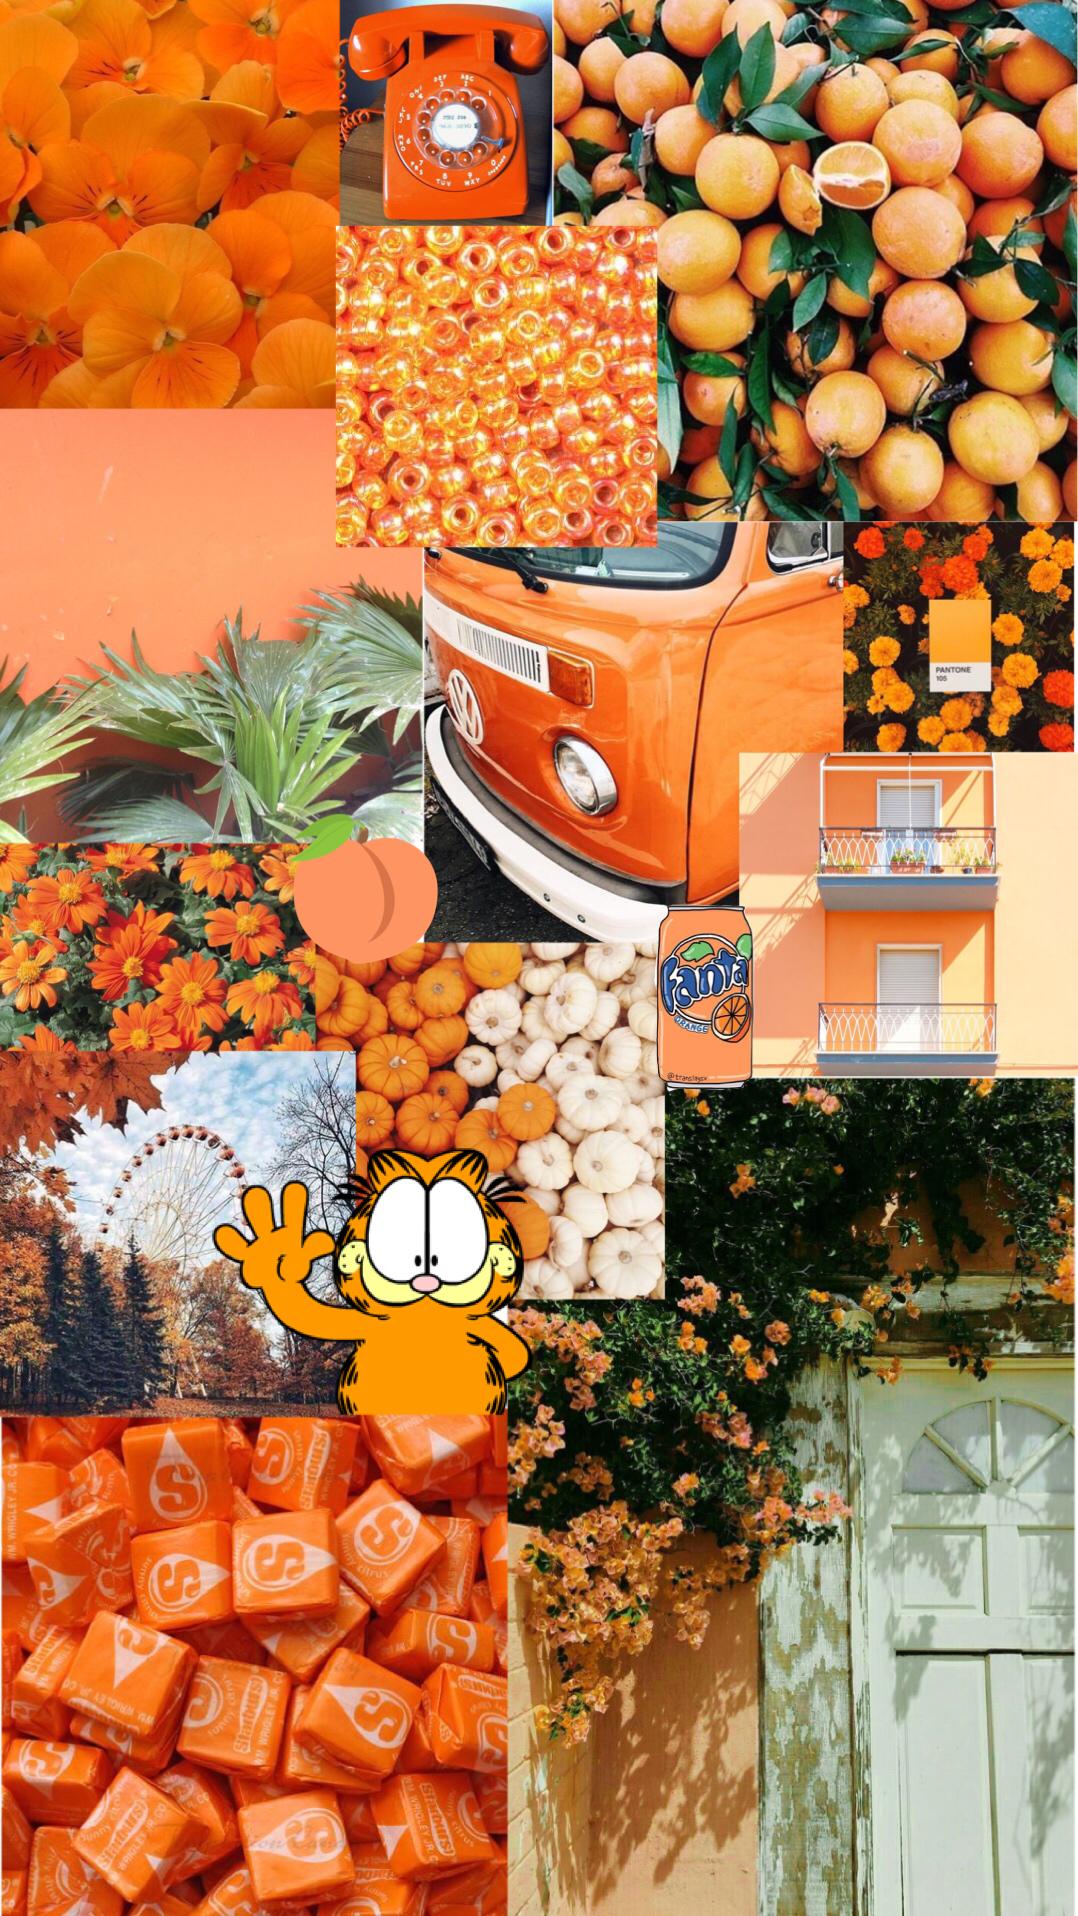 orange aesthetic background Aesthetic wallpapers, Orange